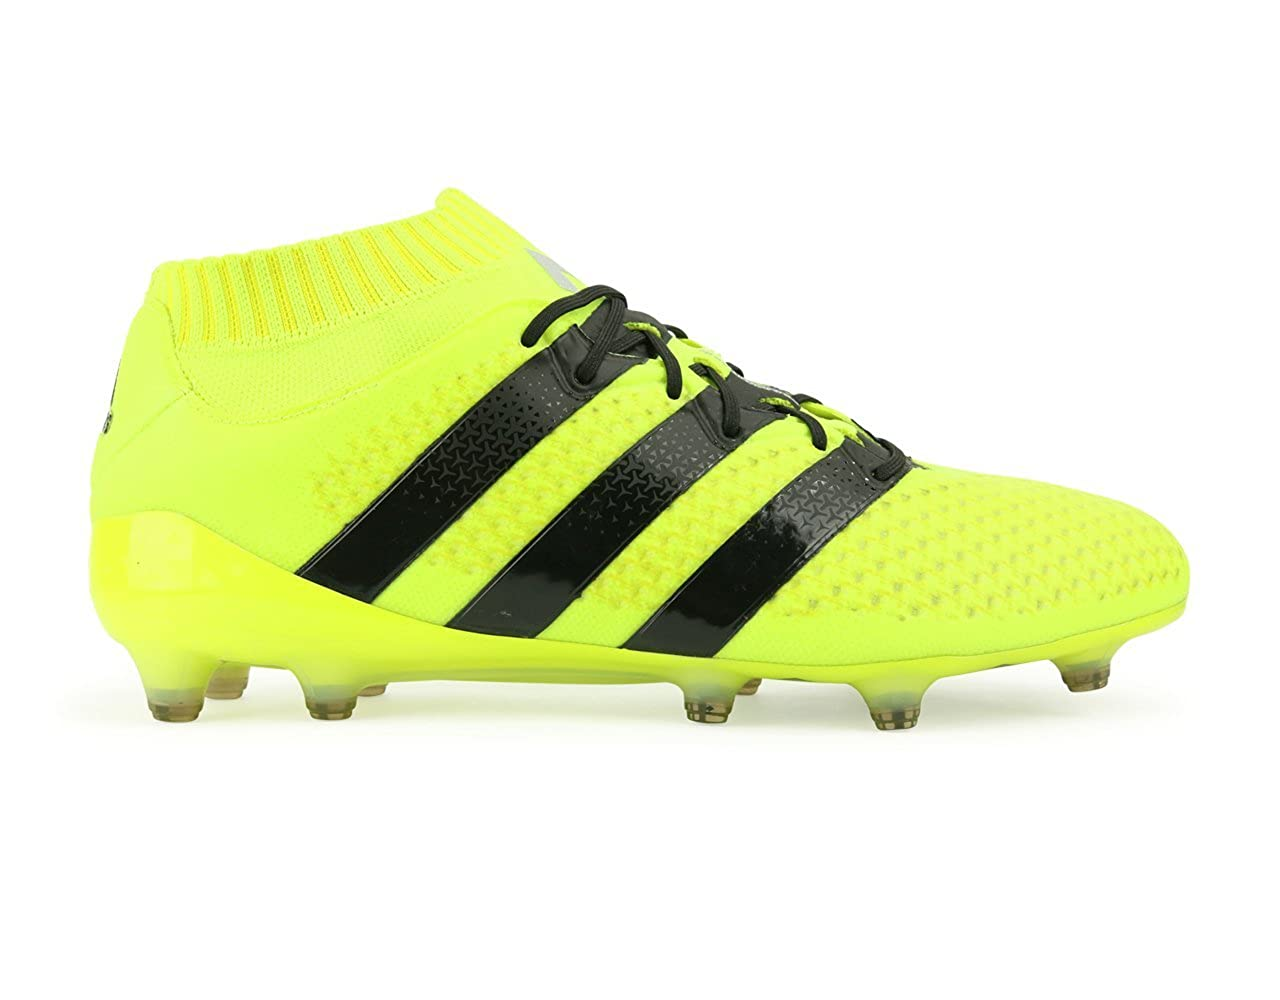 size 40 f16e9 0561c Amazon.com | adidas Men's ACE 16.1 Primeknit FG/AG Solar ...